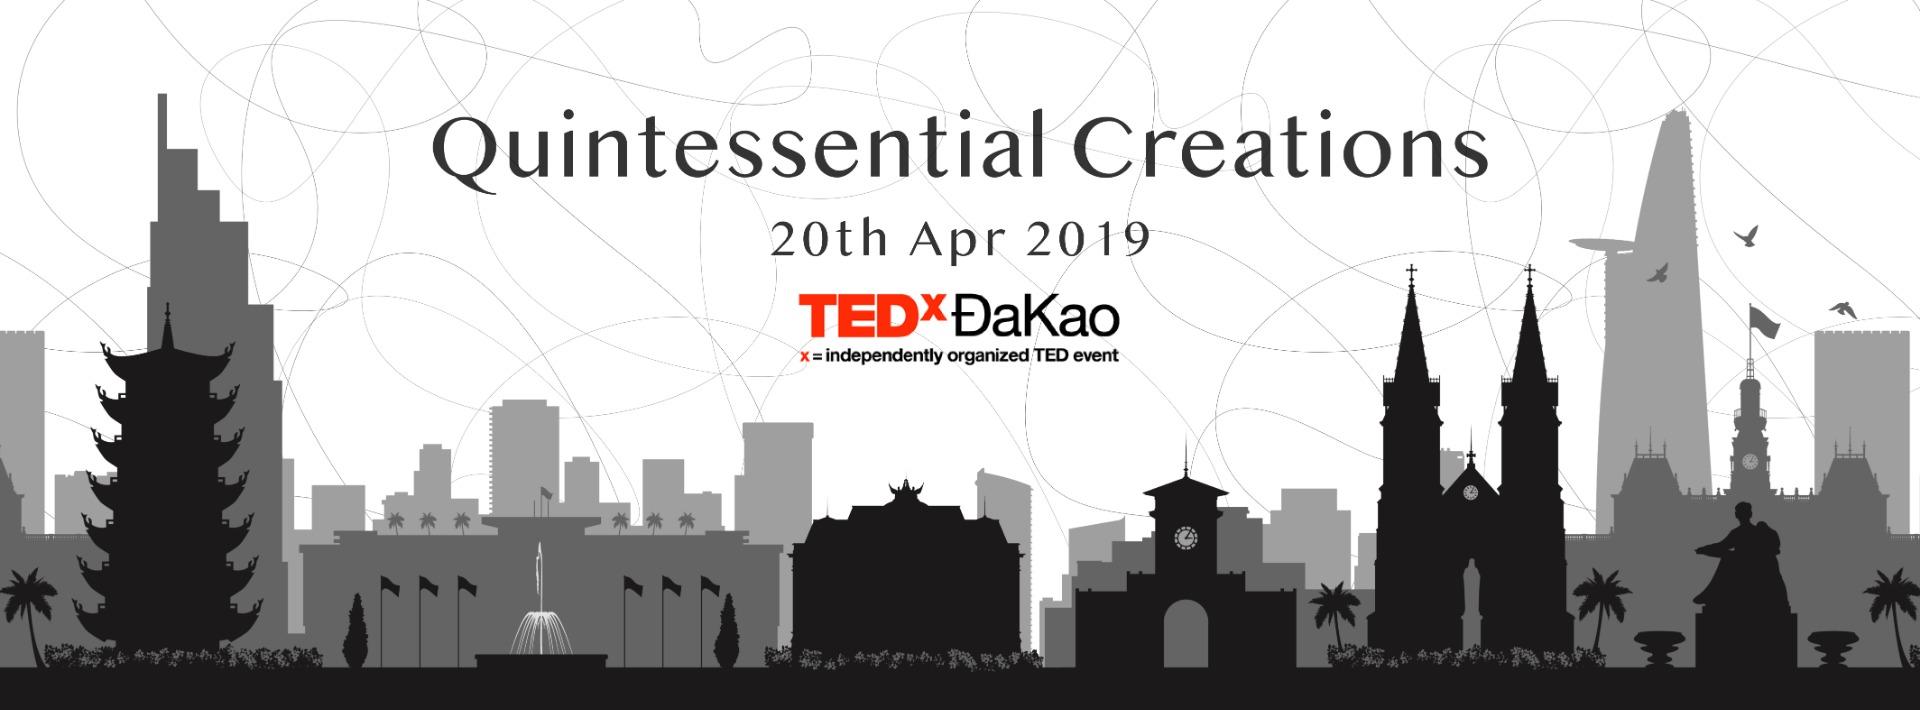 TEDxĐaKao: Quintessential Creations | 20. 04. 2019